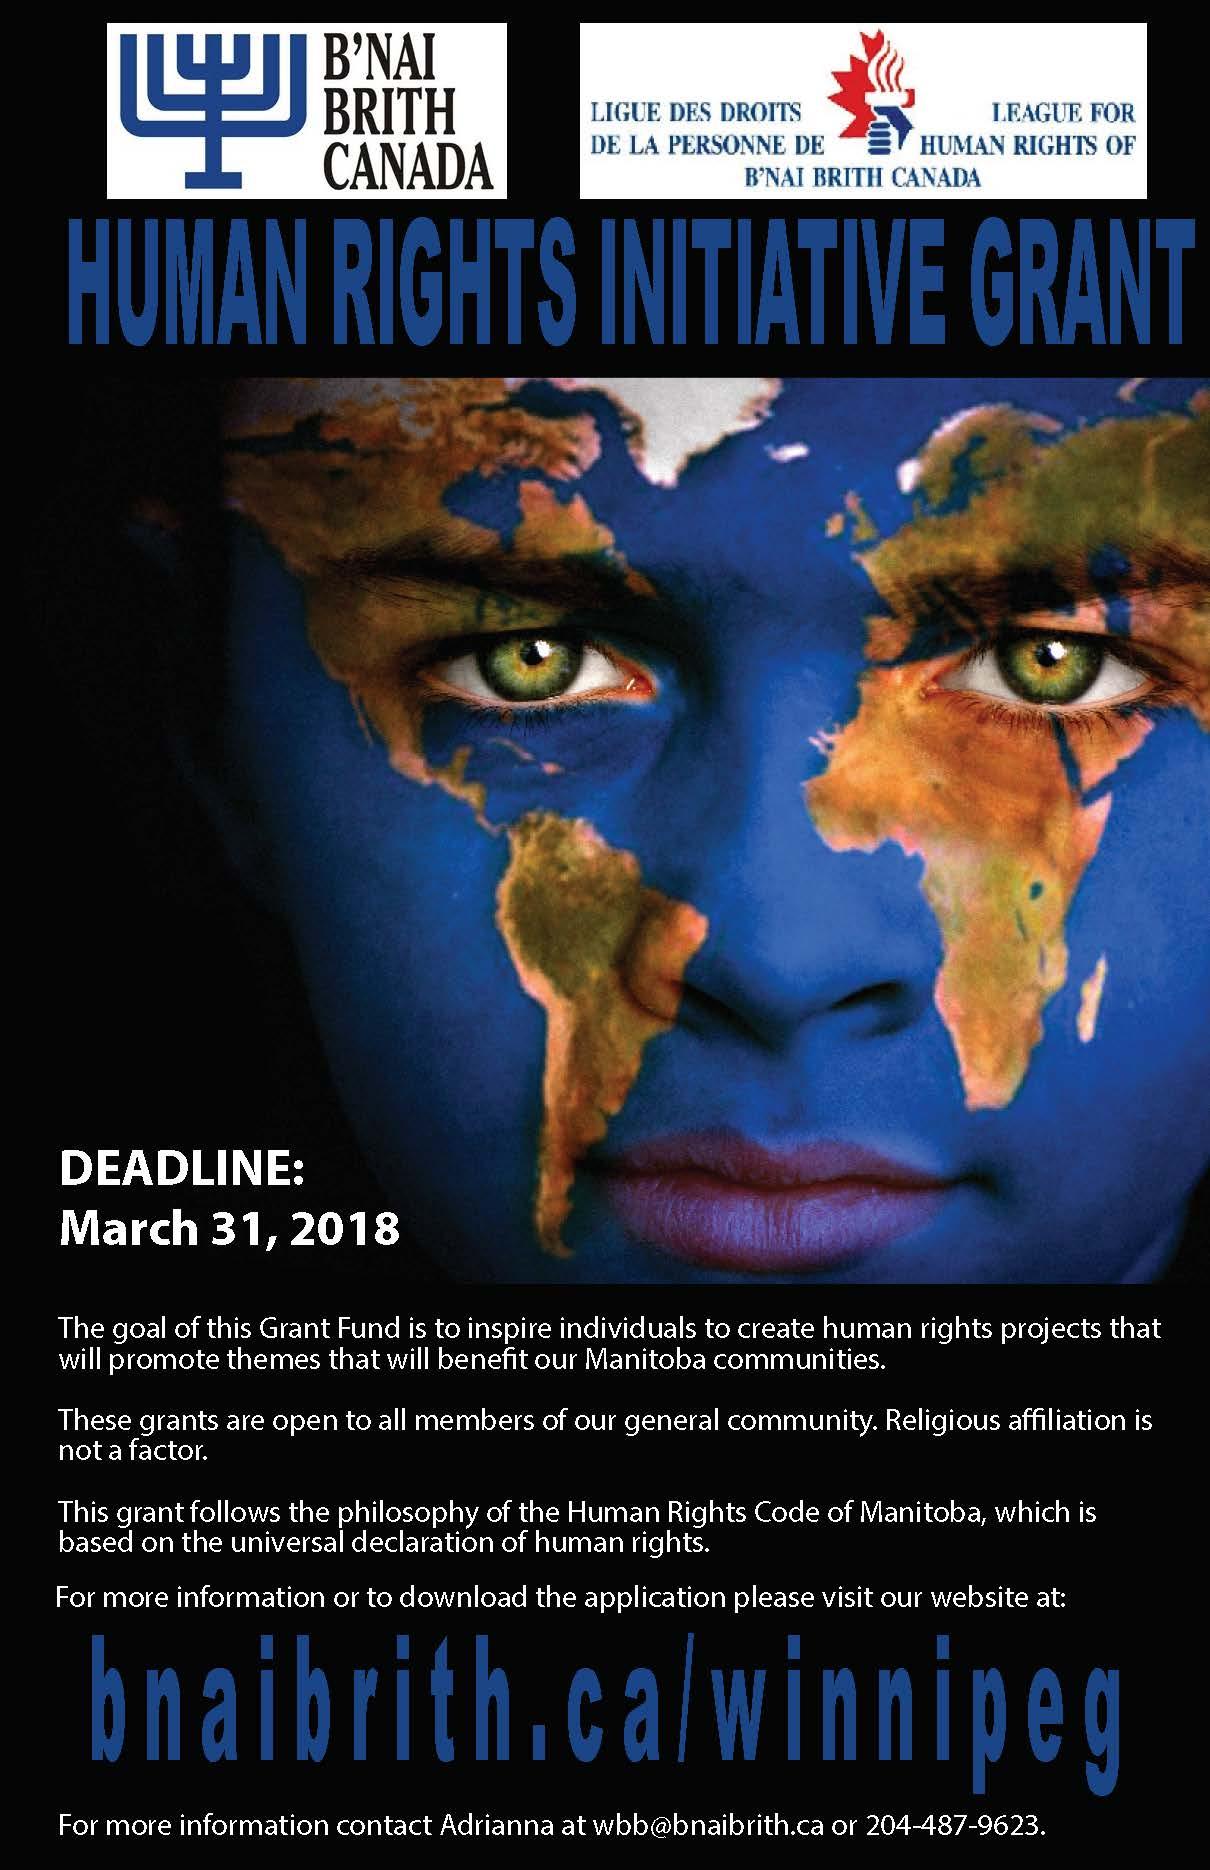 Human_Rights_Grant_Poster_Feb_2017-1.jpg